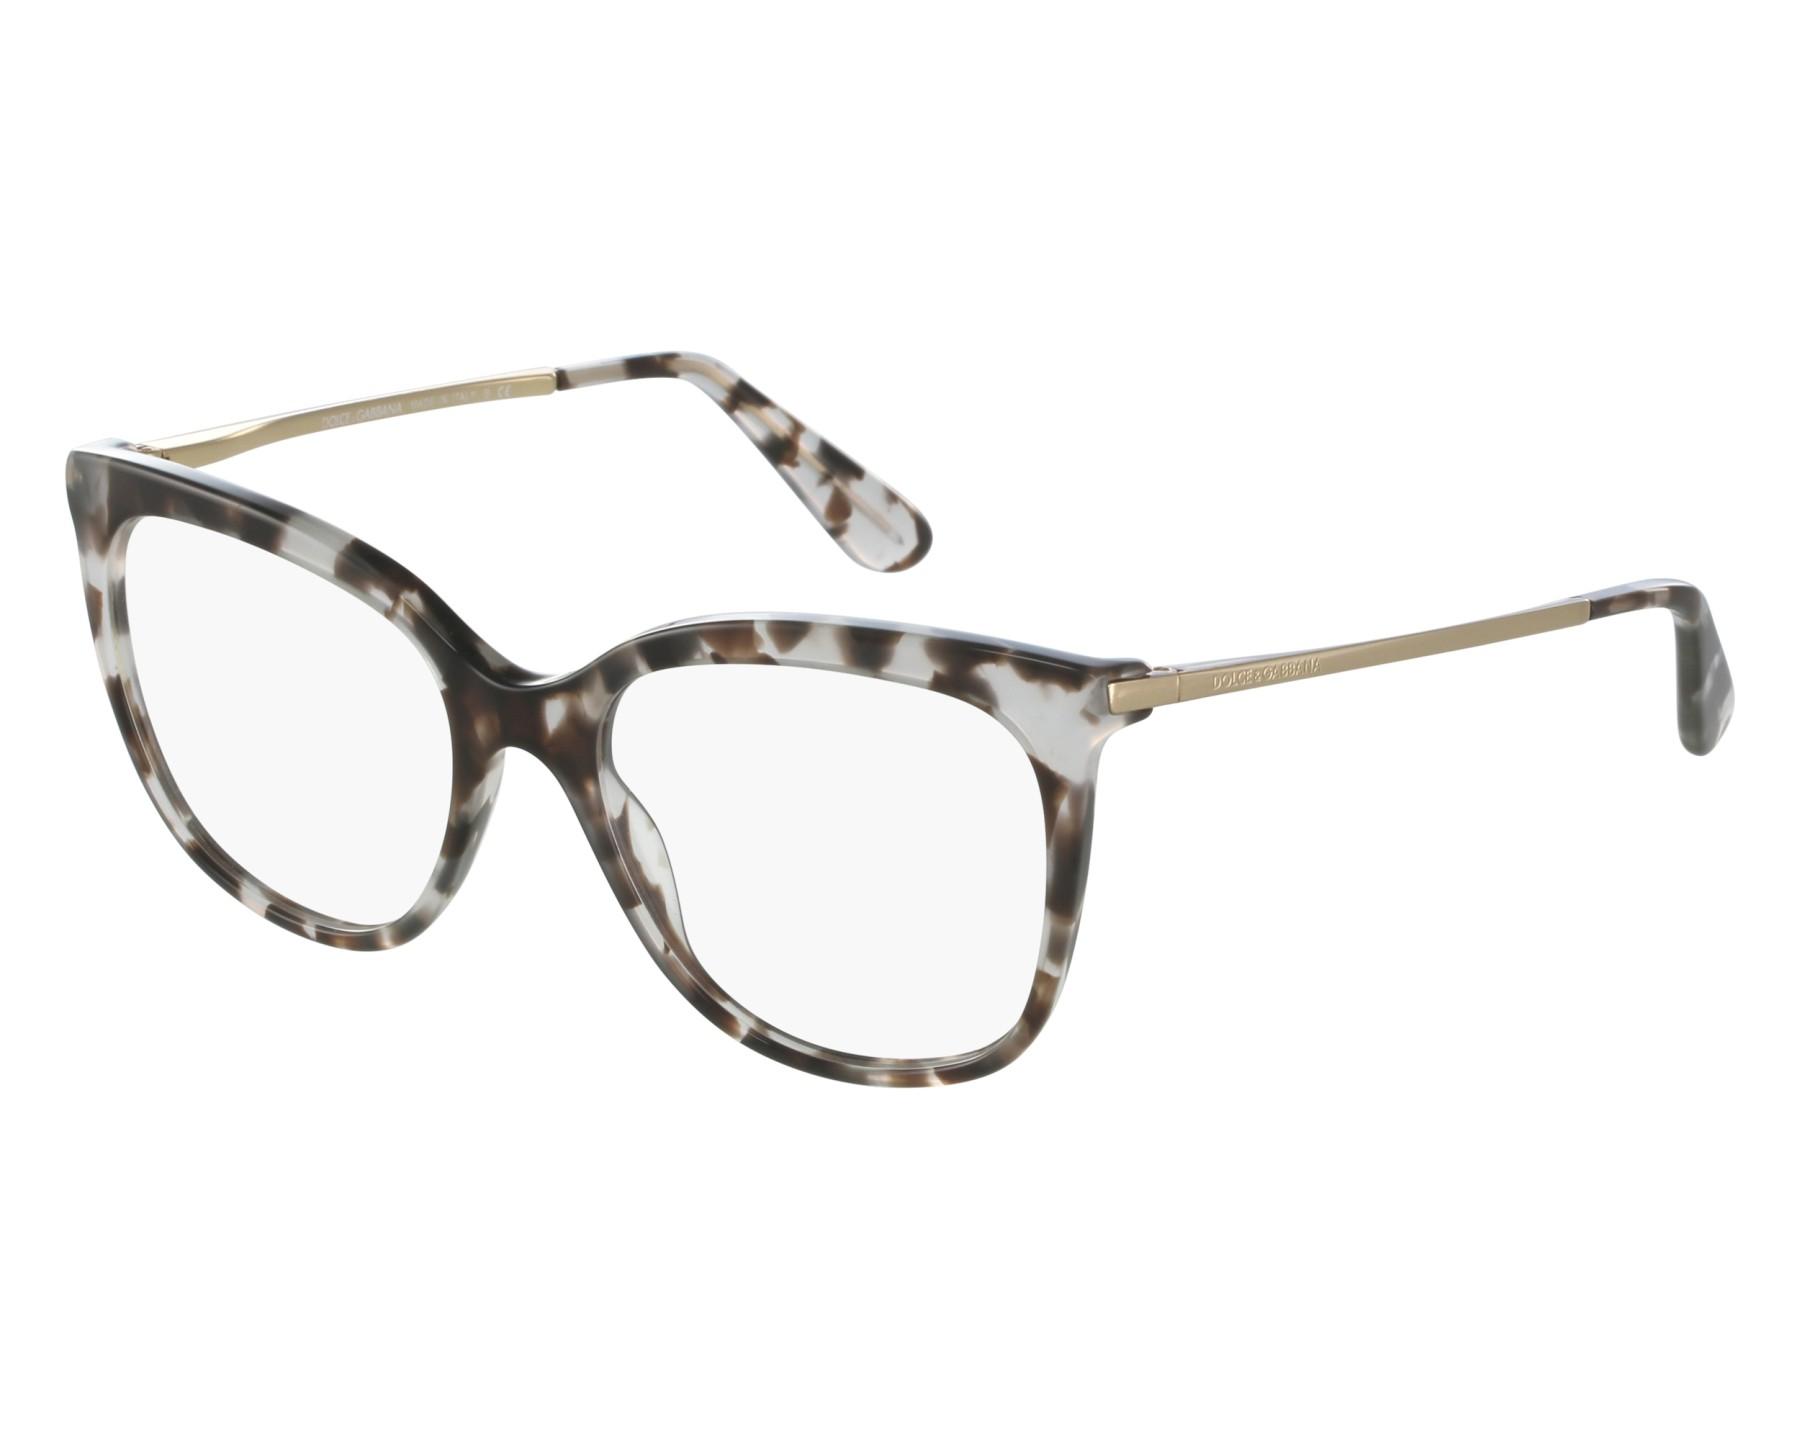 2142e2eaf1d eyeglasses Dolce   Gabbana DG-3259 2888 53-17 Grey Gold front view